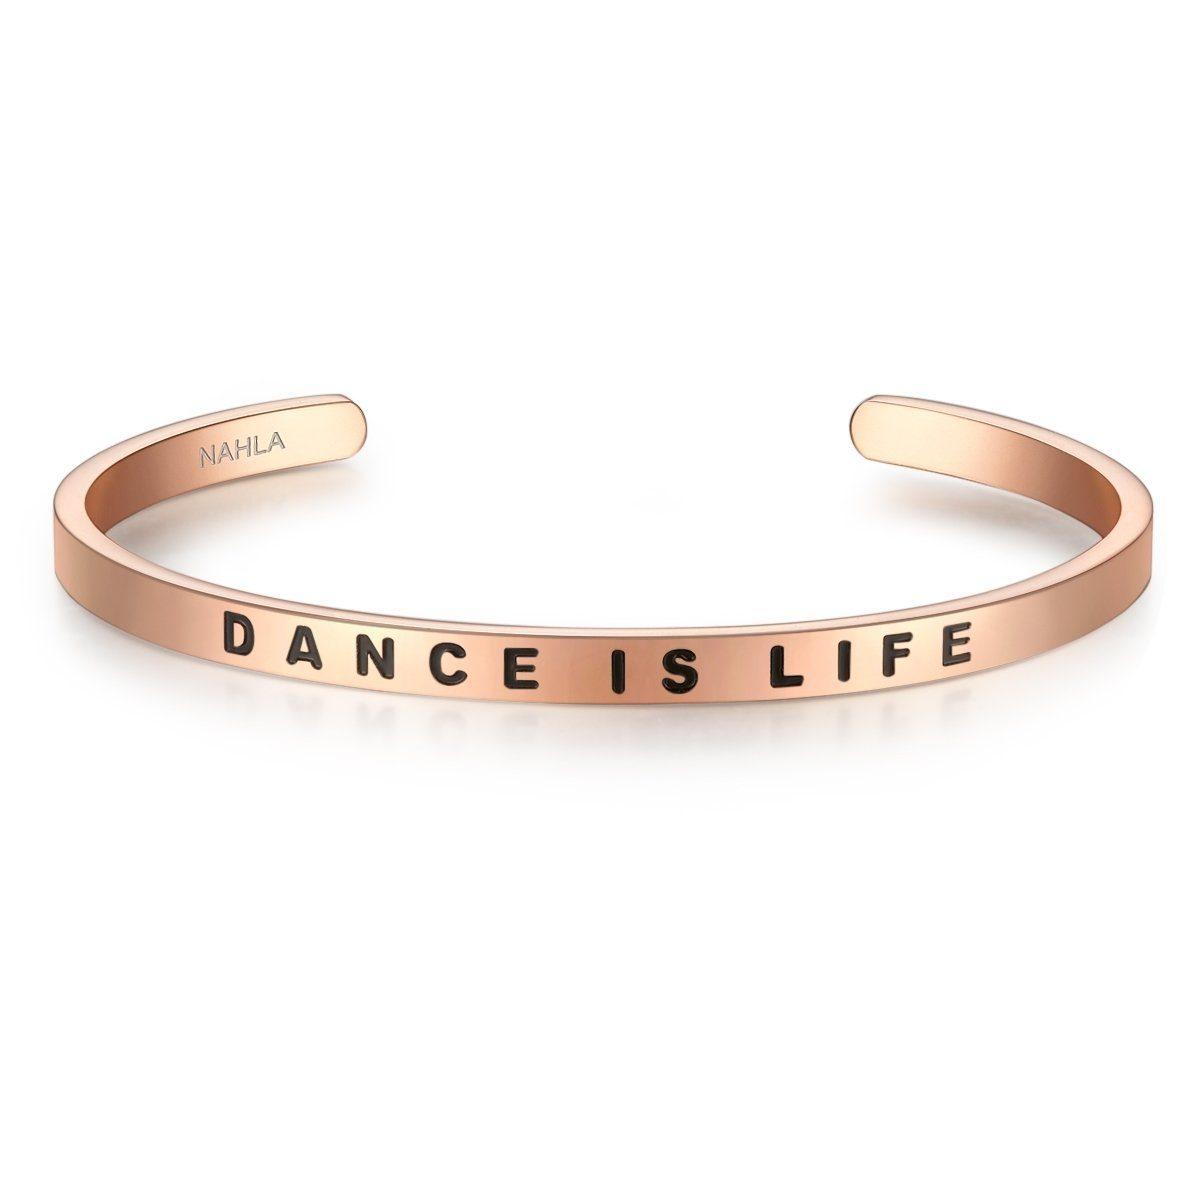 Nahla Jewels Armreif »X401« mit Slogan DANCE IS LIFE